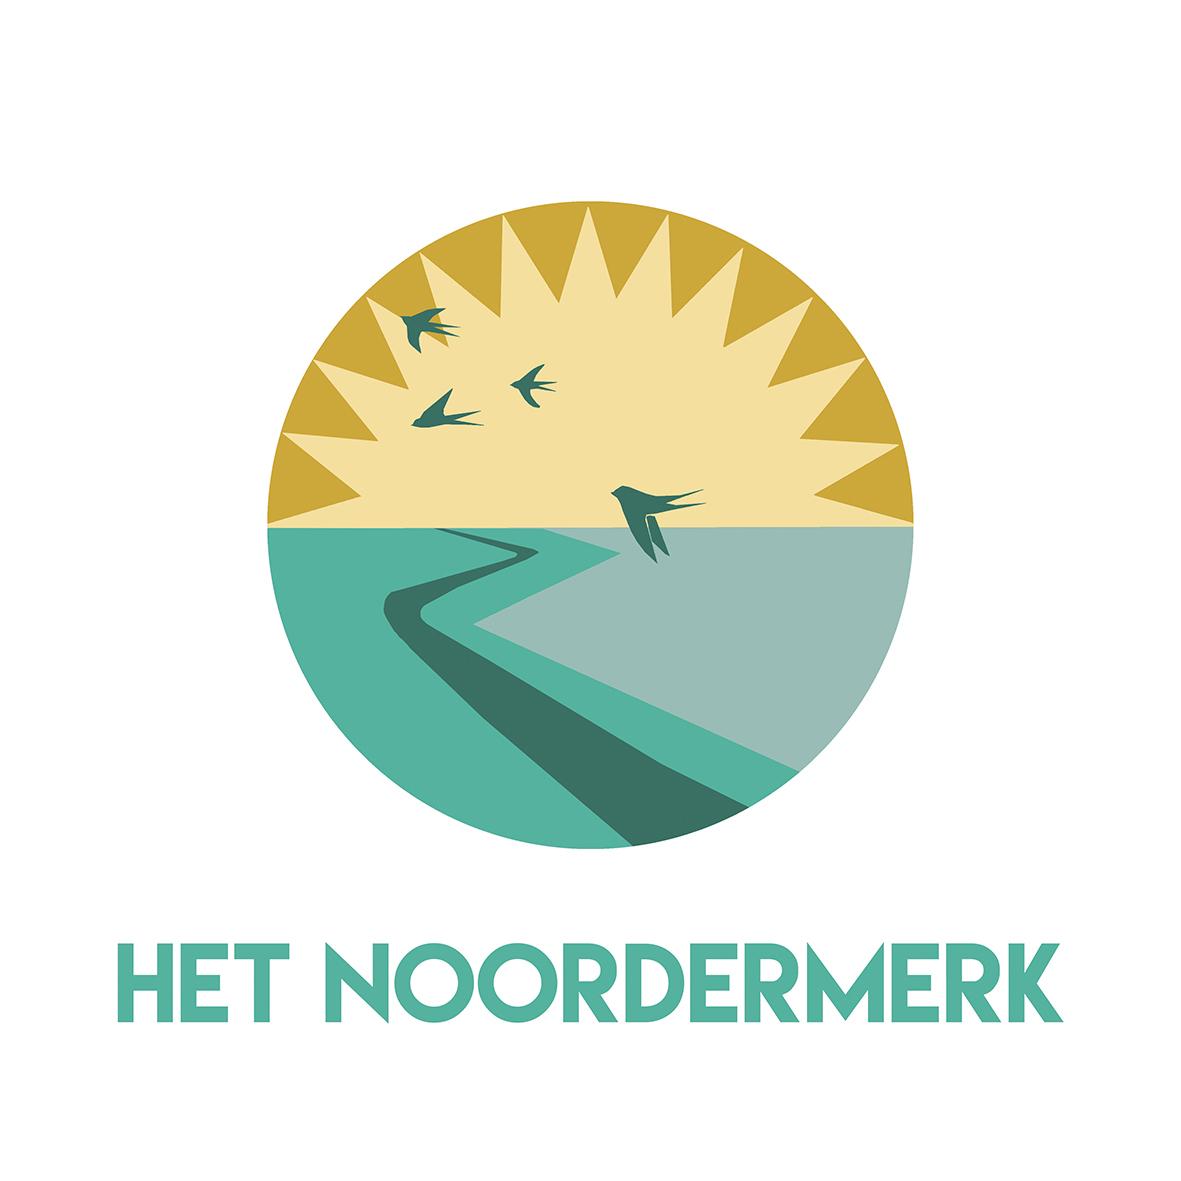 https://marieketenberge.nl/app/uploads/2017/08/noorder_1181x1181_acf_cropped.jpg